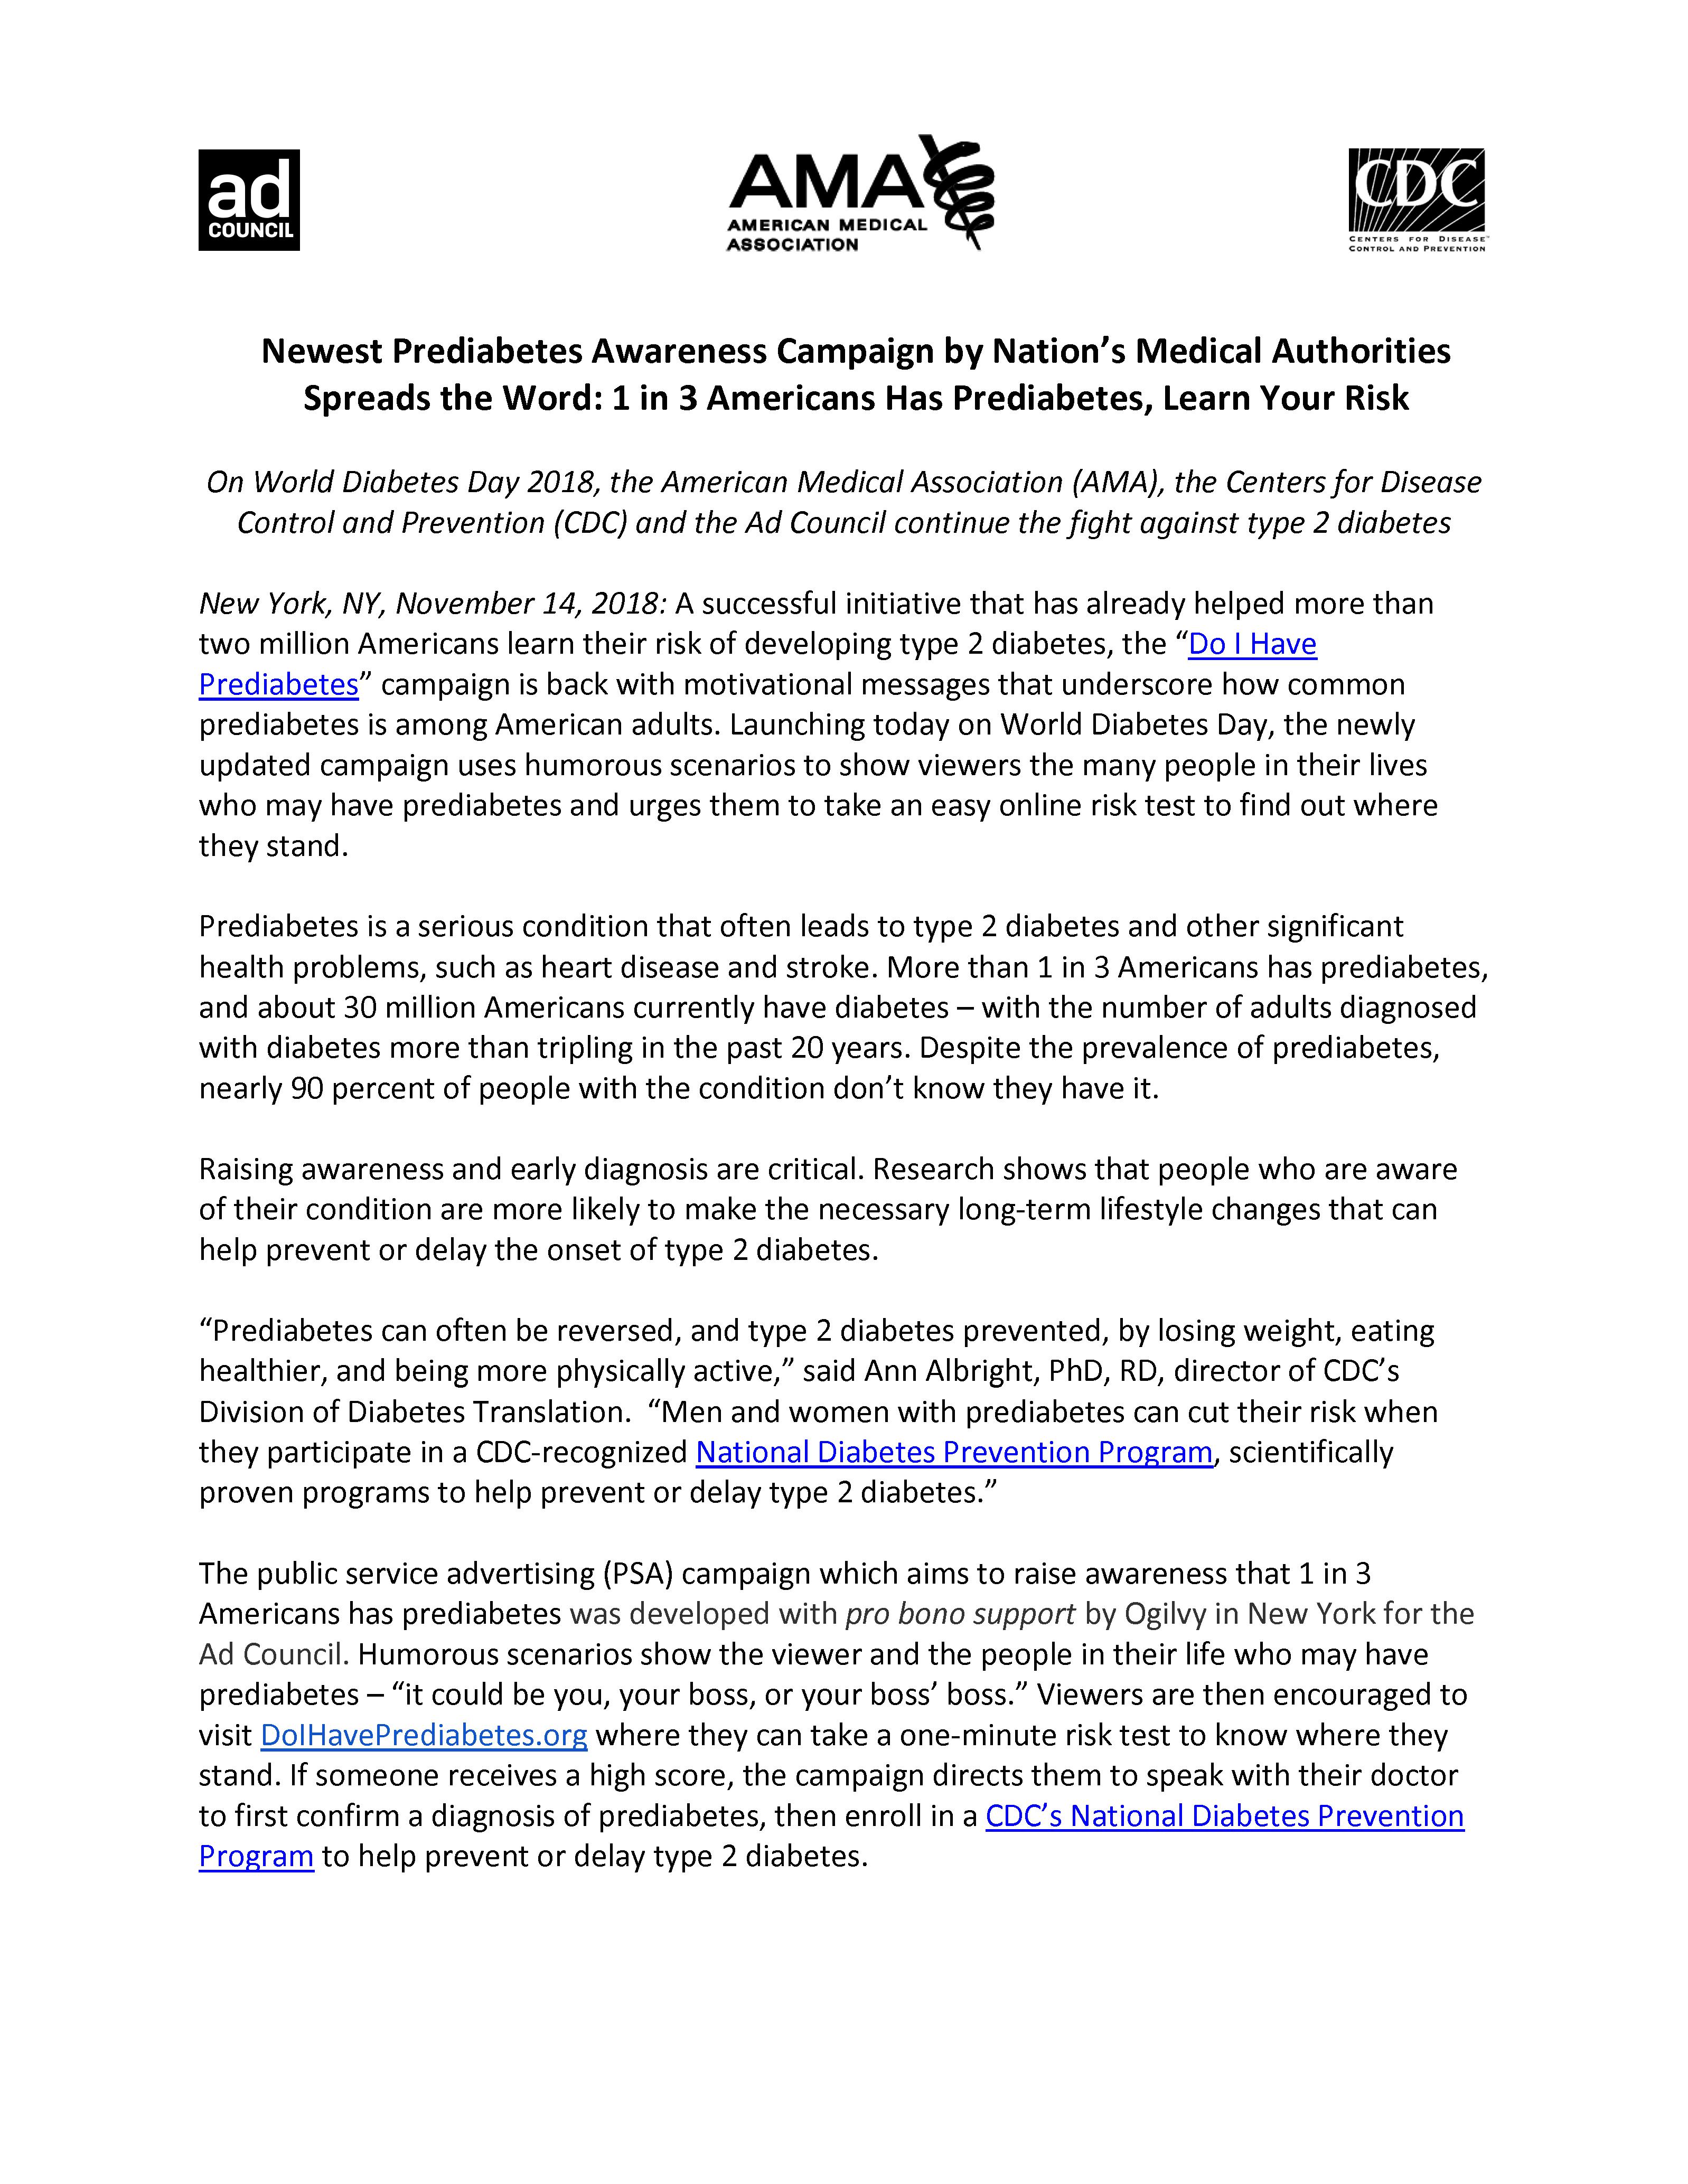 Prediabetes_Press_Release_Nov_2018_Page_1